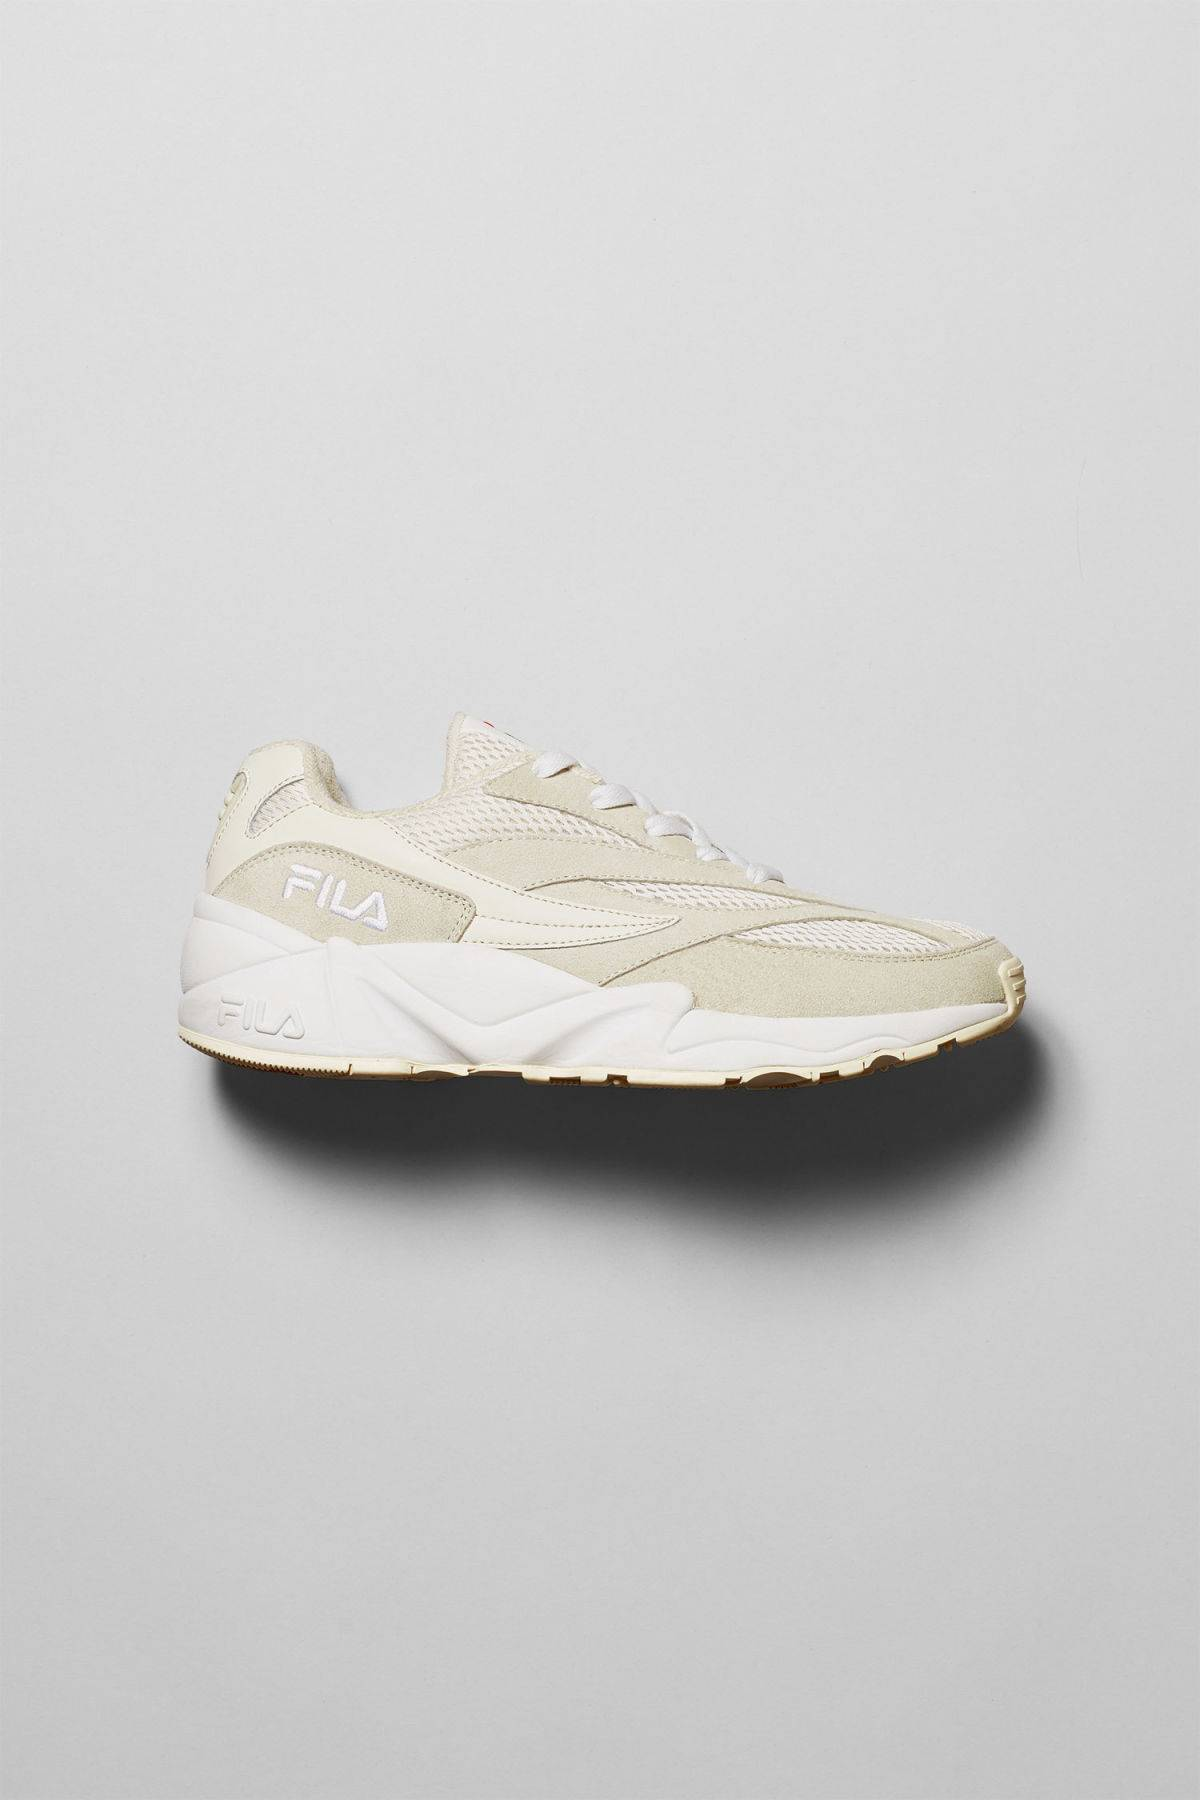 Venom Low Sneakers - White-38